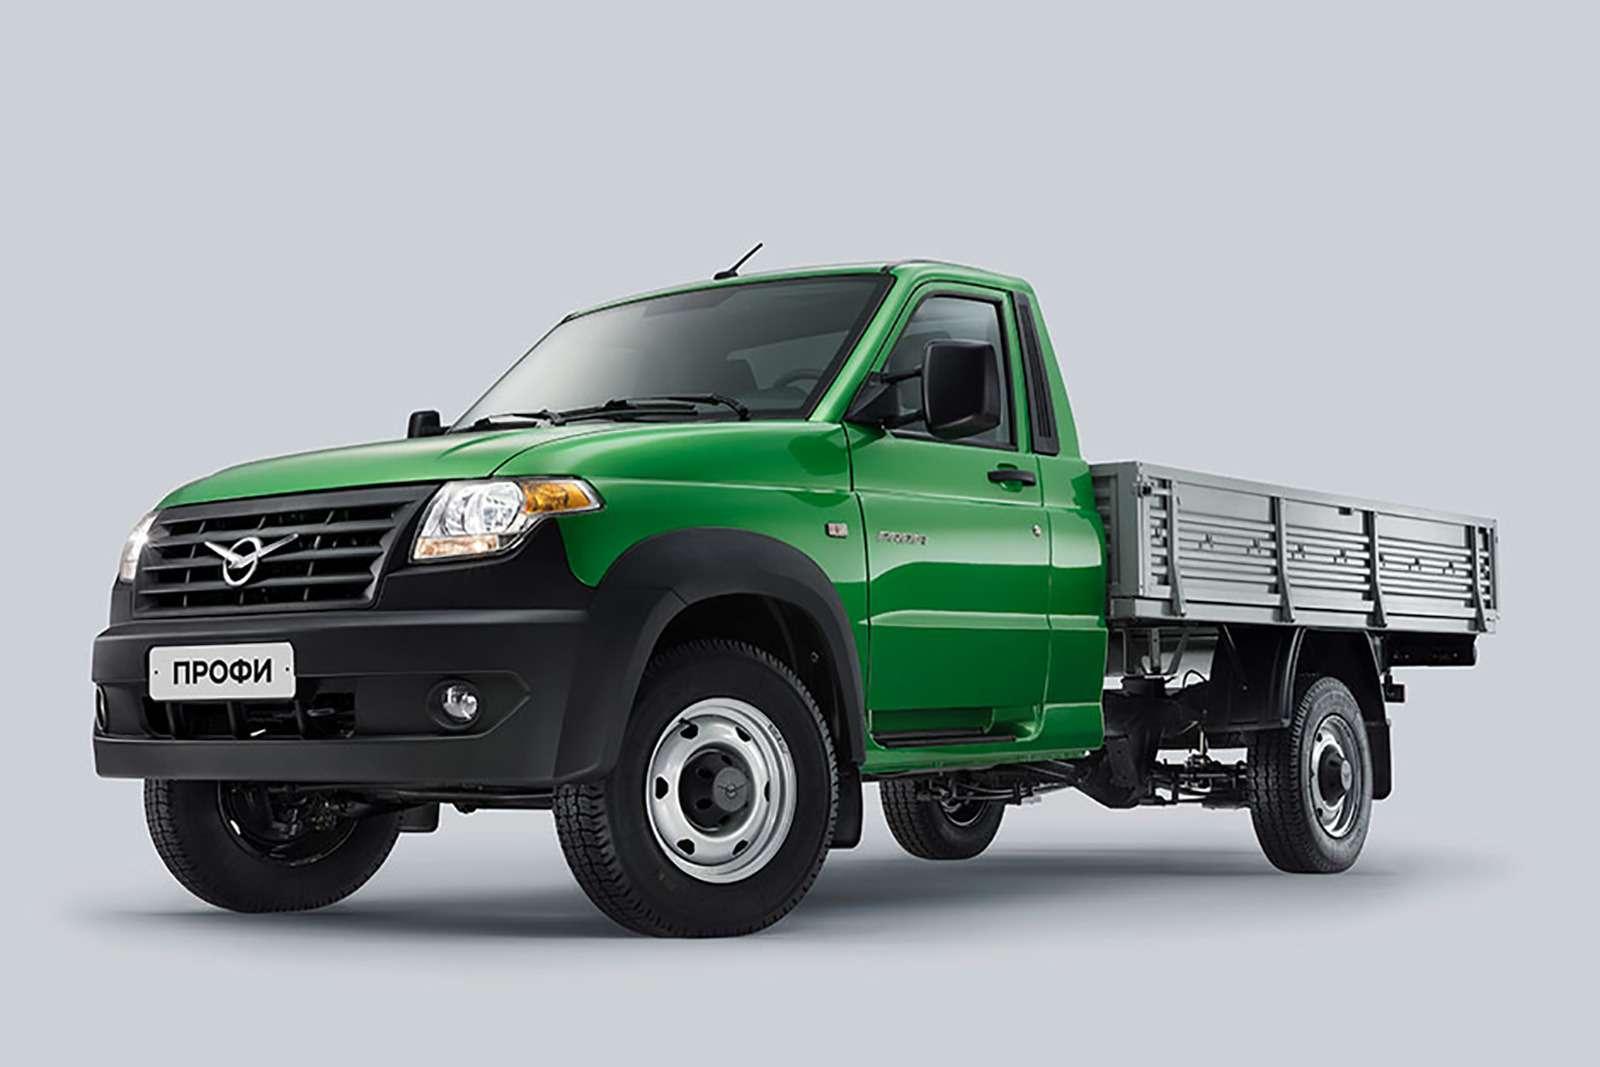 УАЗначал продажи конкурента ГАЗели Бизнес— фото 805857